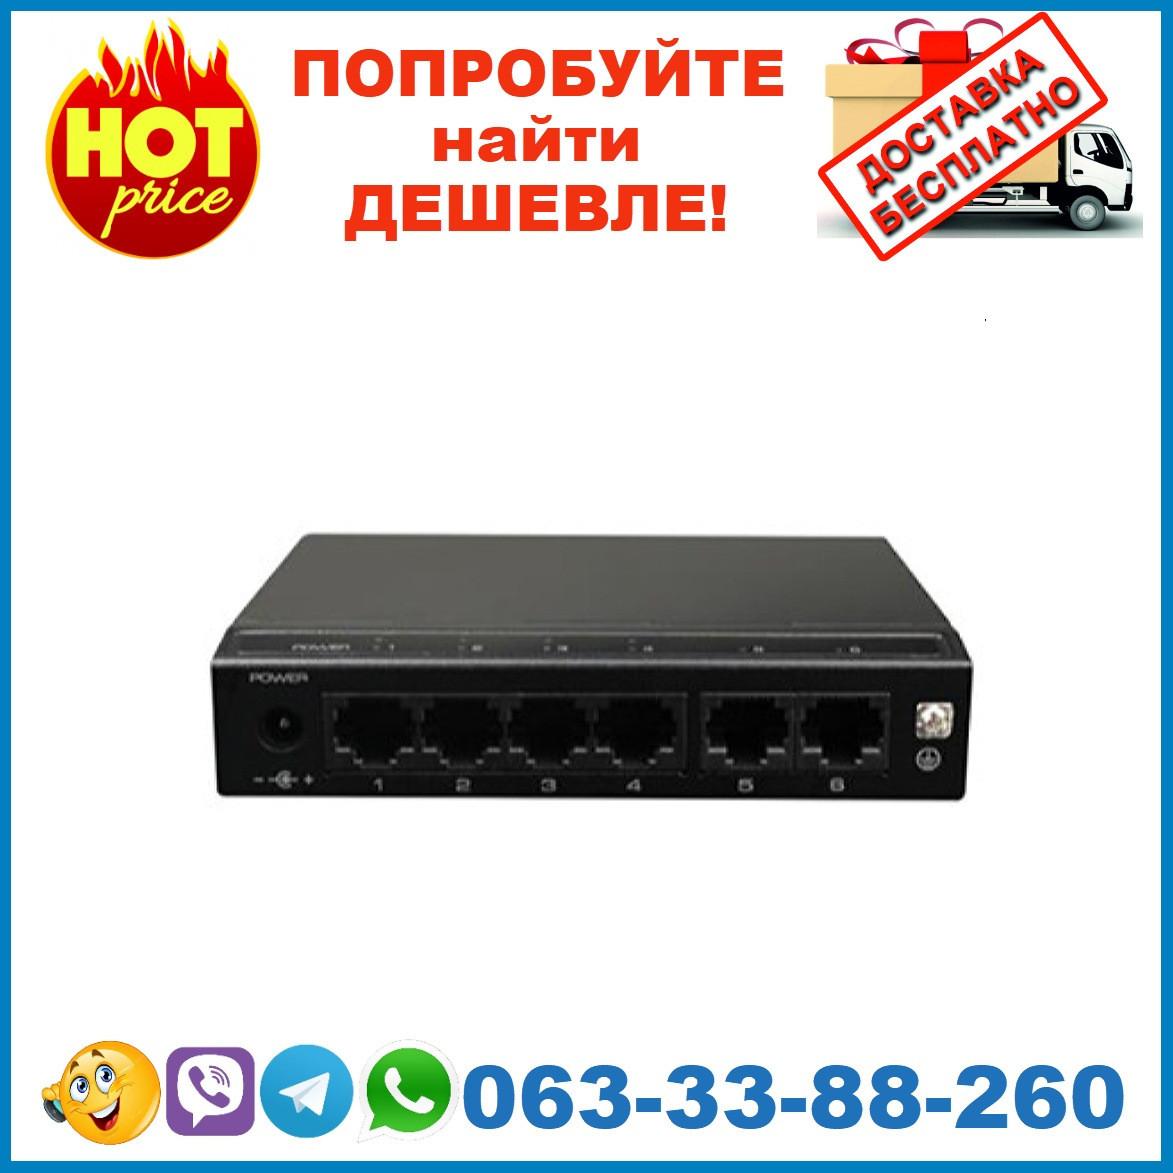 SF6P-HM  4-портовый PoE коммутатор UTEPO